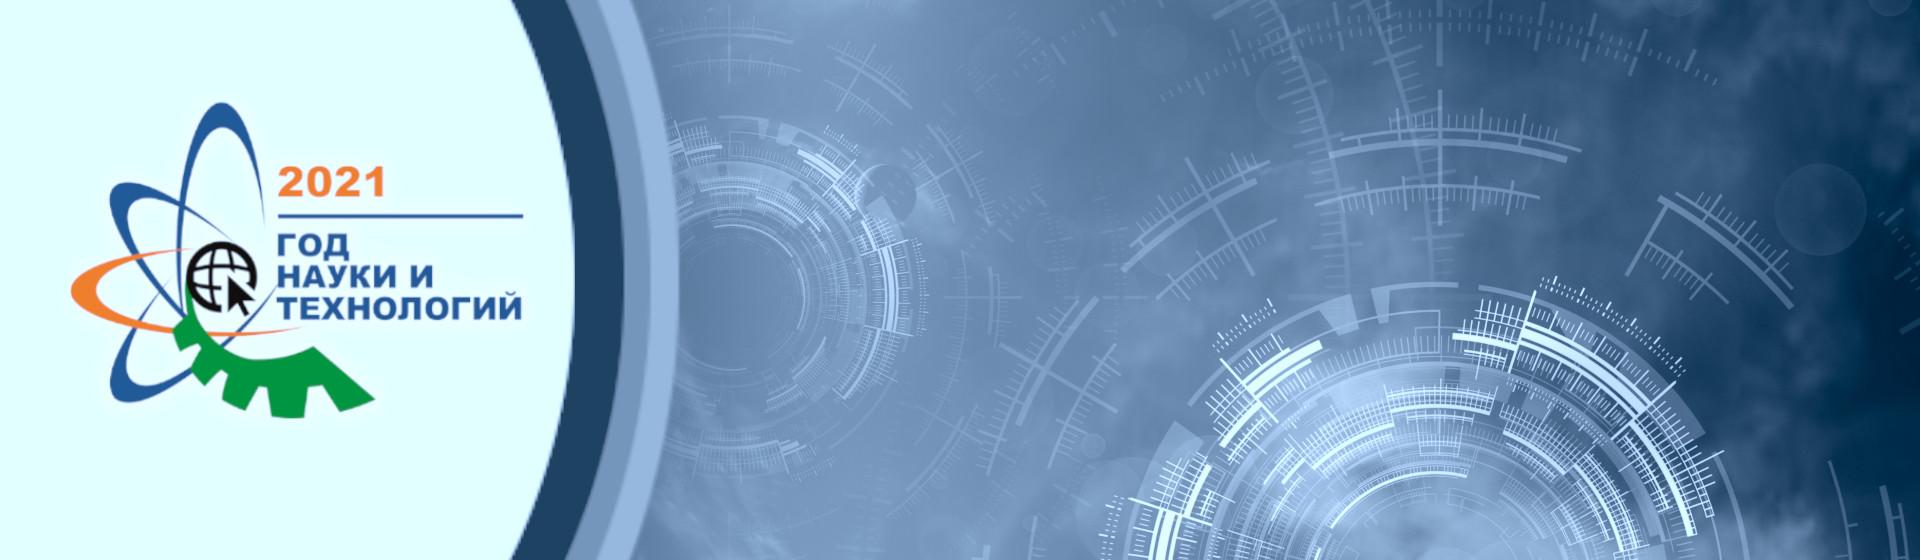 2021 - Год науки и технологий